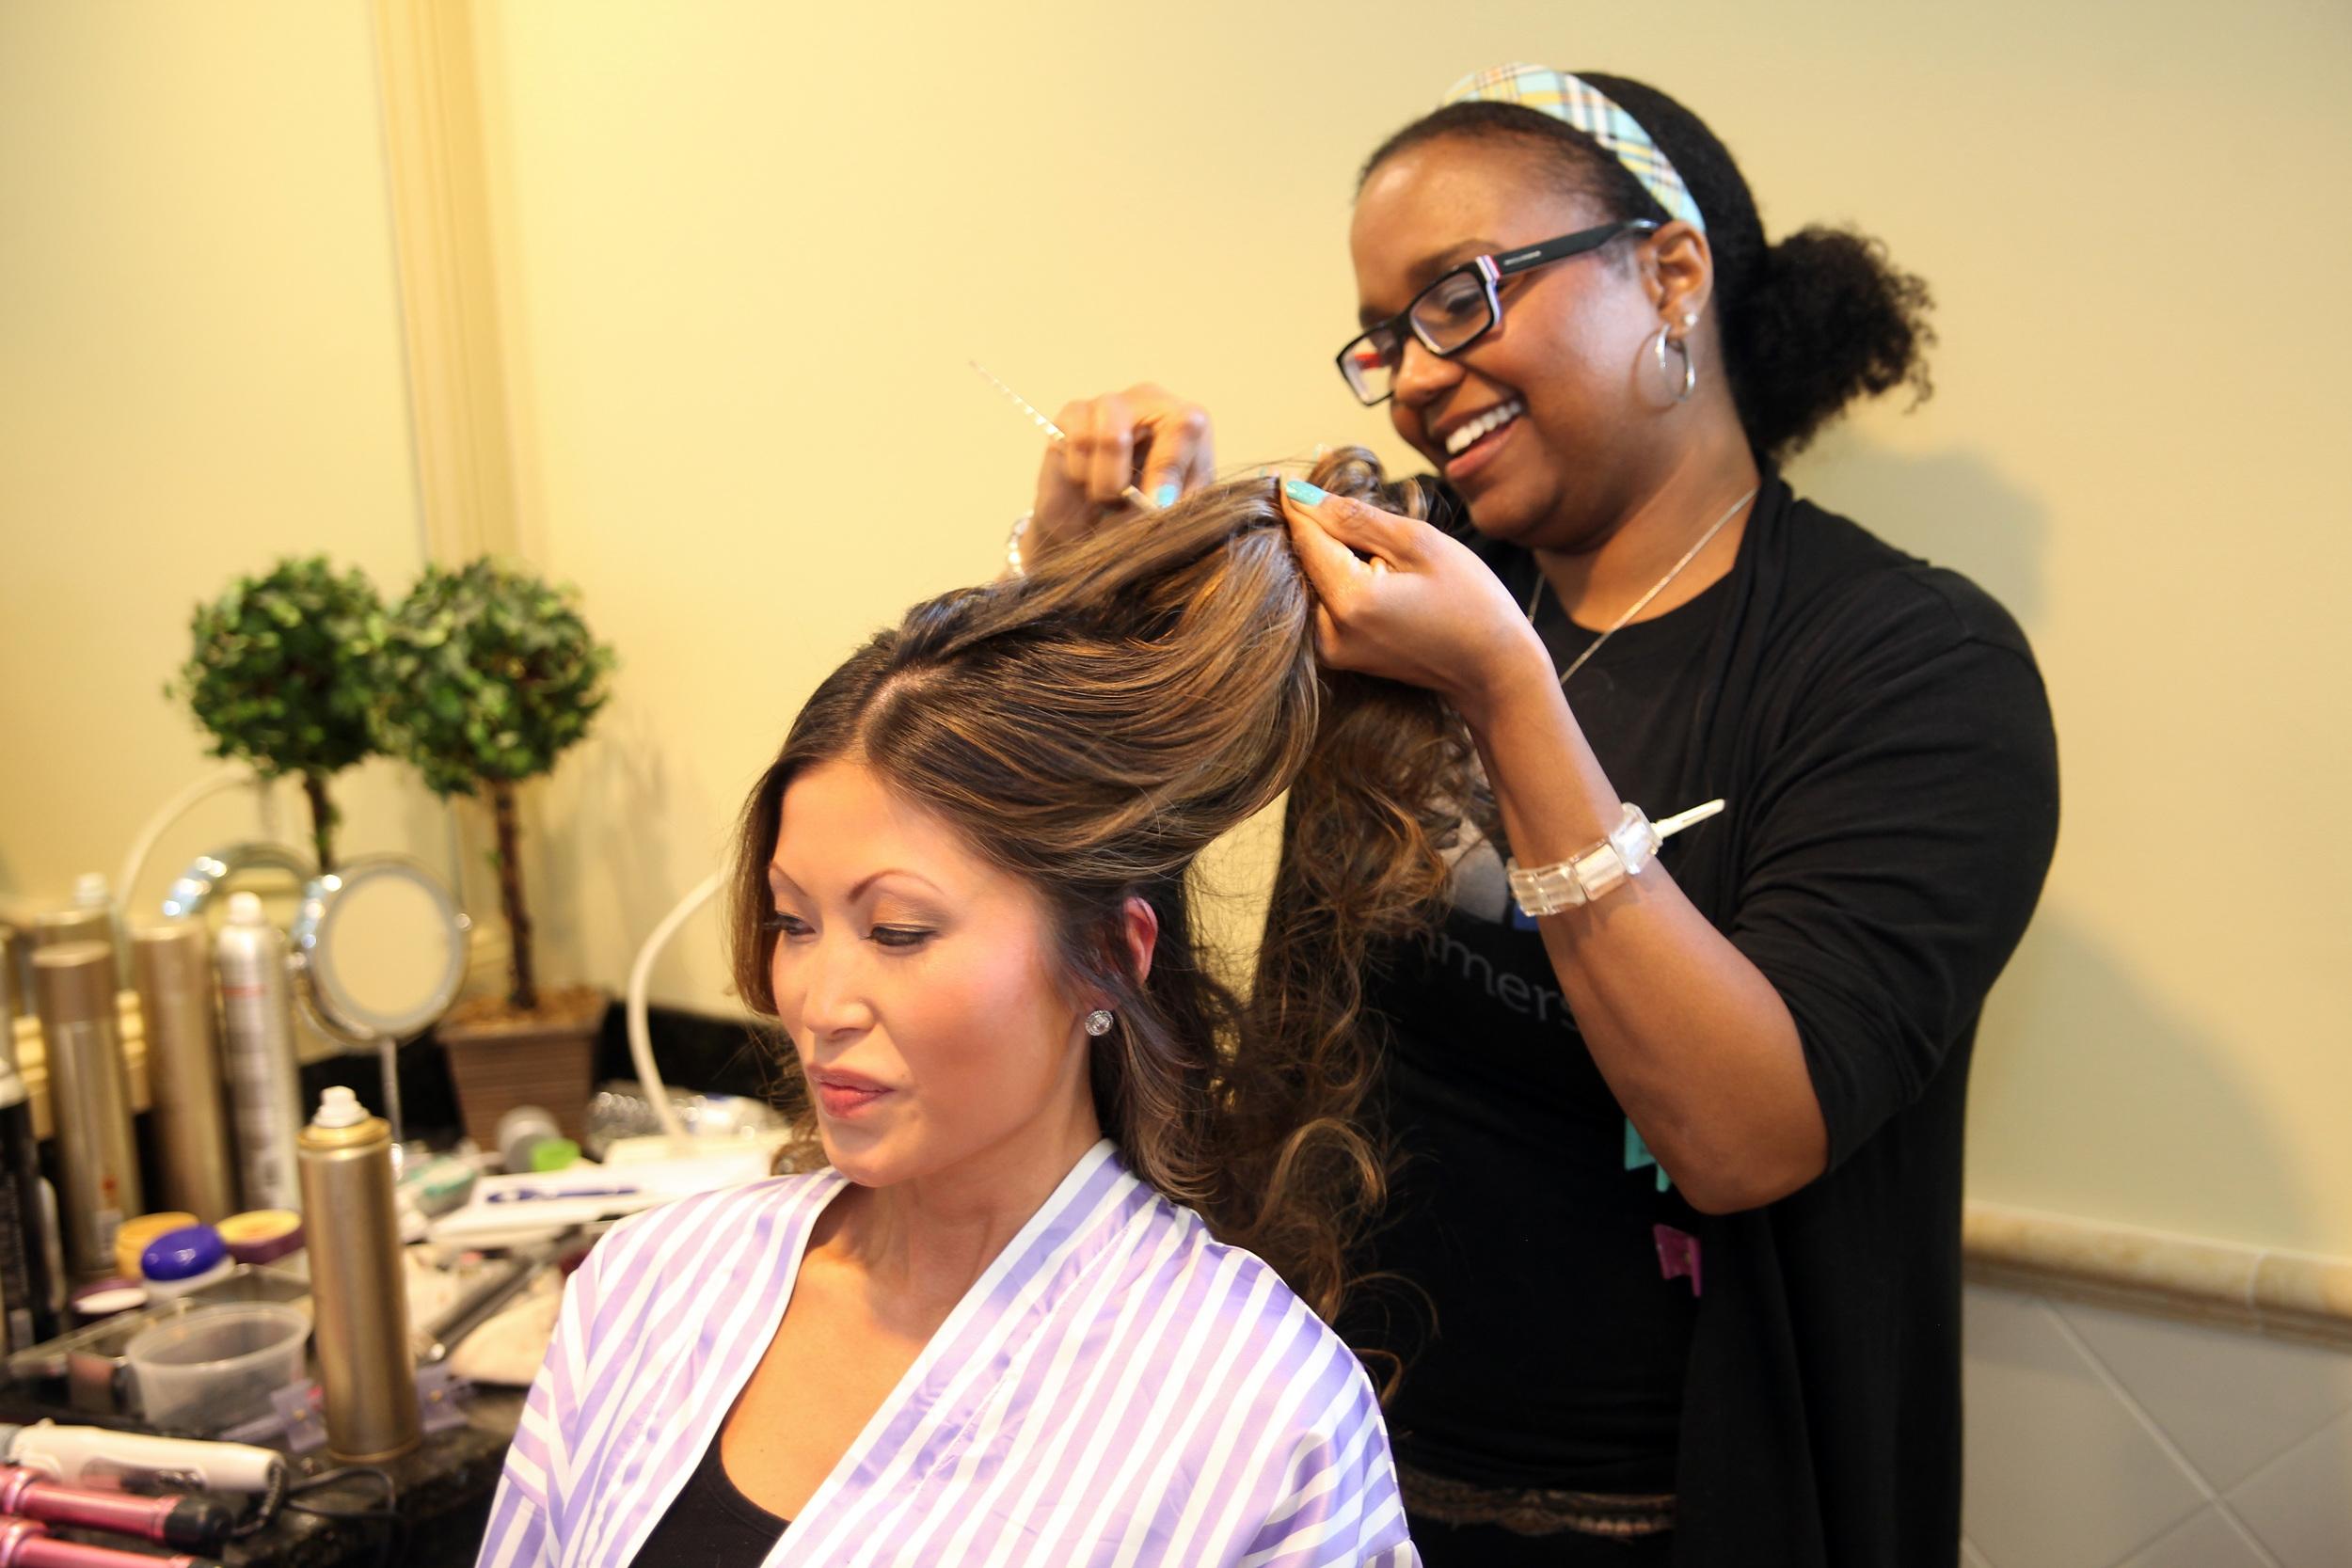 ERICA - CEO AND LEAD HAIR STYLIST